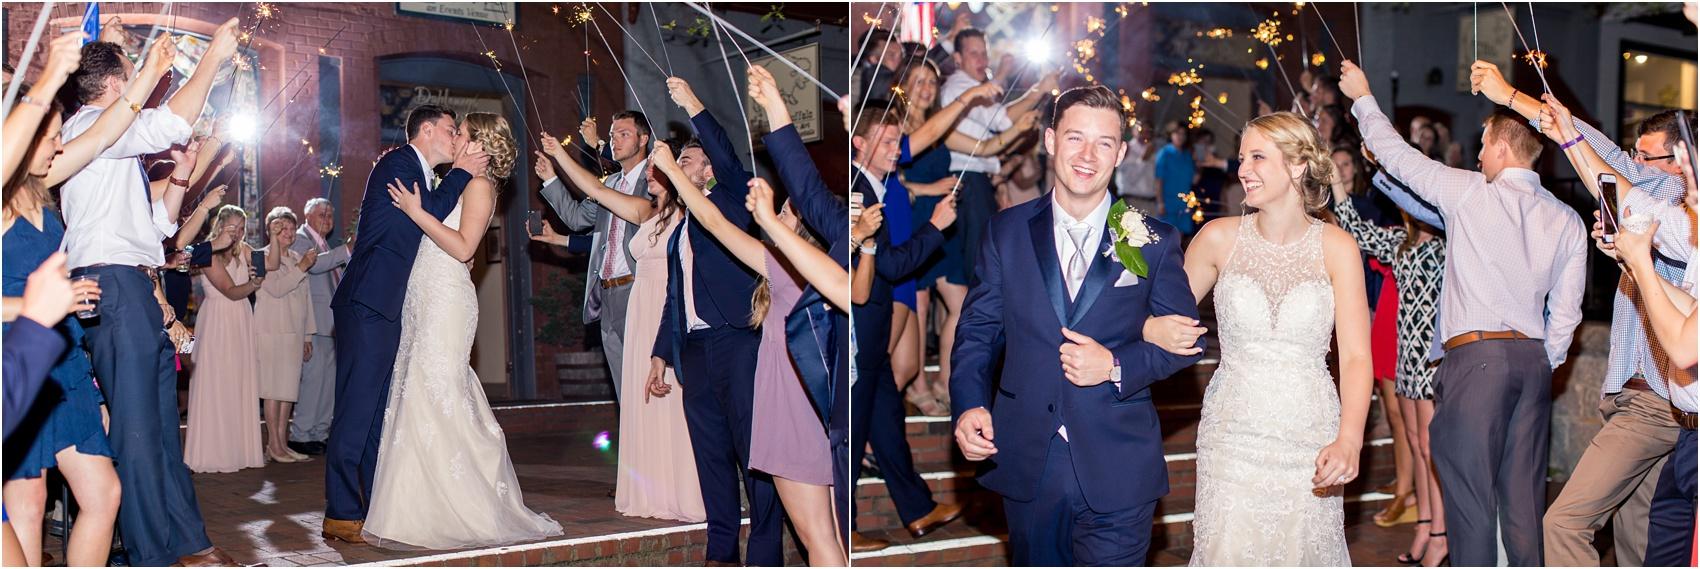 Savannah Eve Photography- Roper-Powell Wedding- Blog-81.jpg